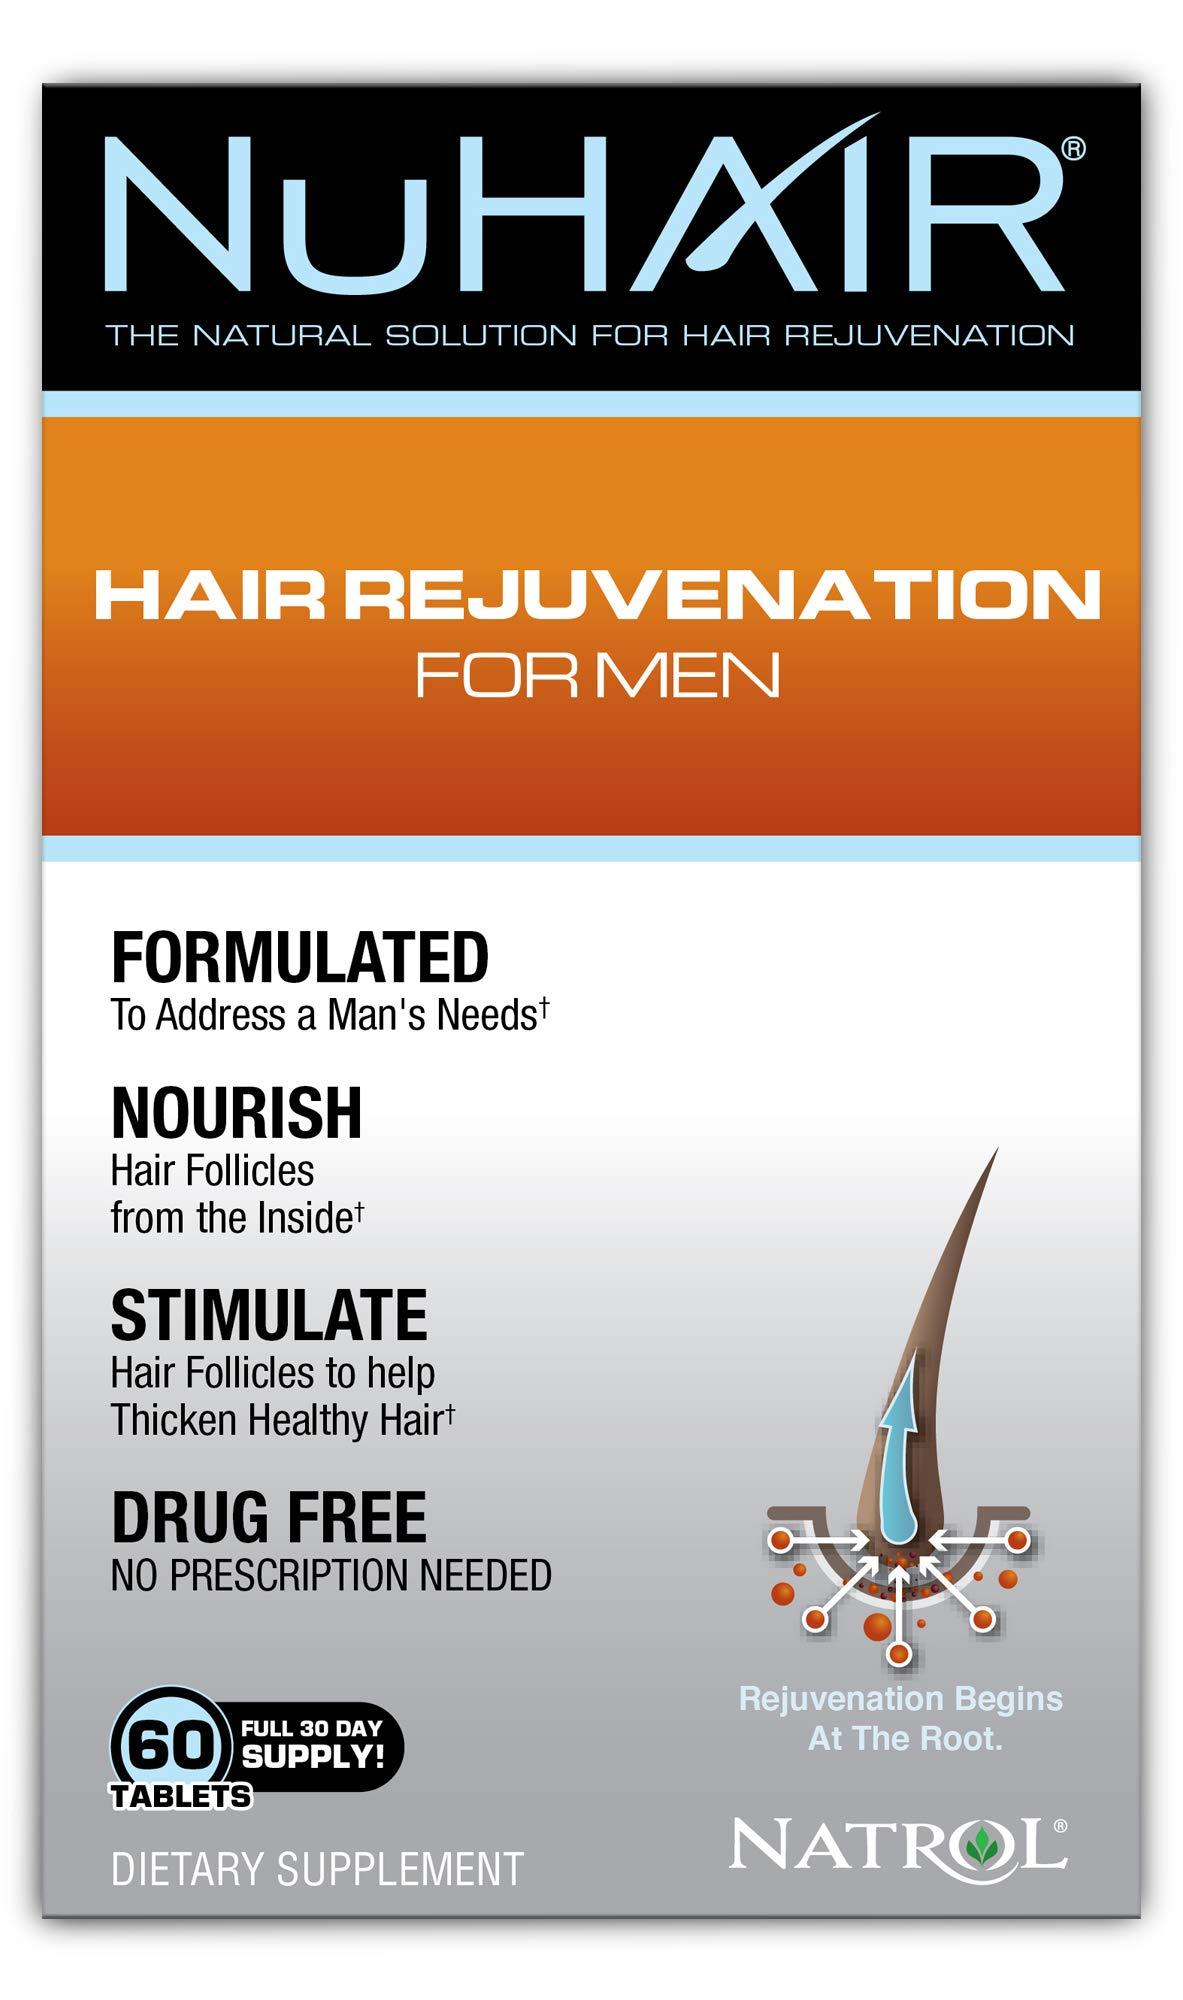 NuHair Hair Rejuvenation for Men, Tablets, 60 Count